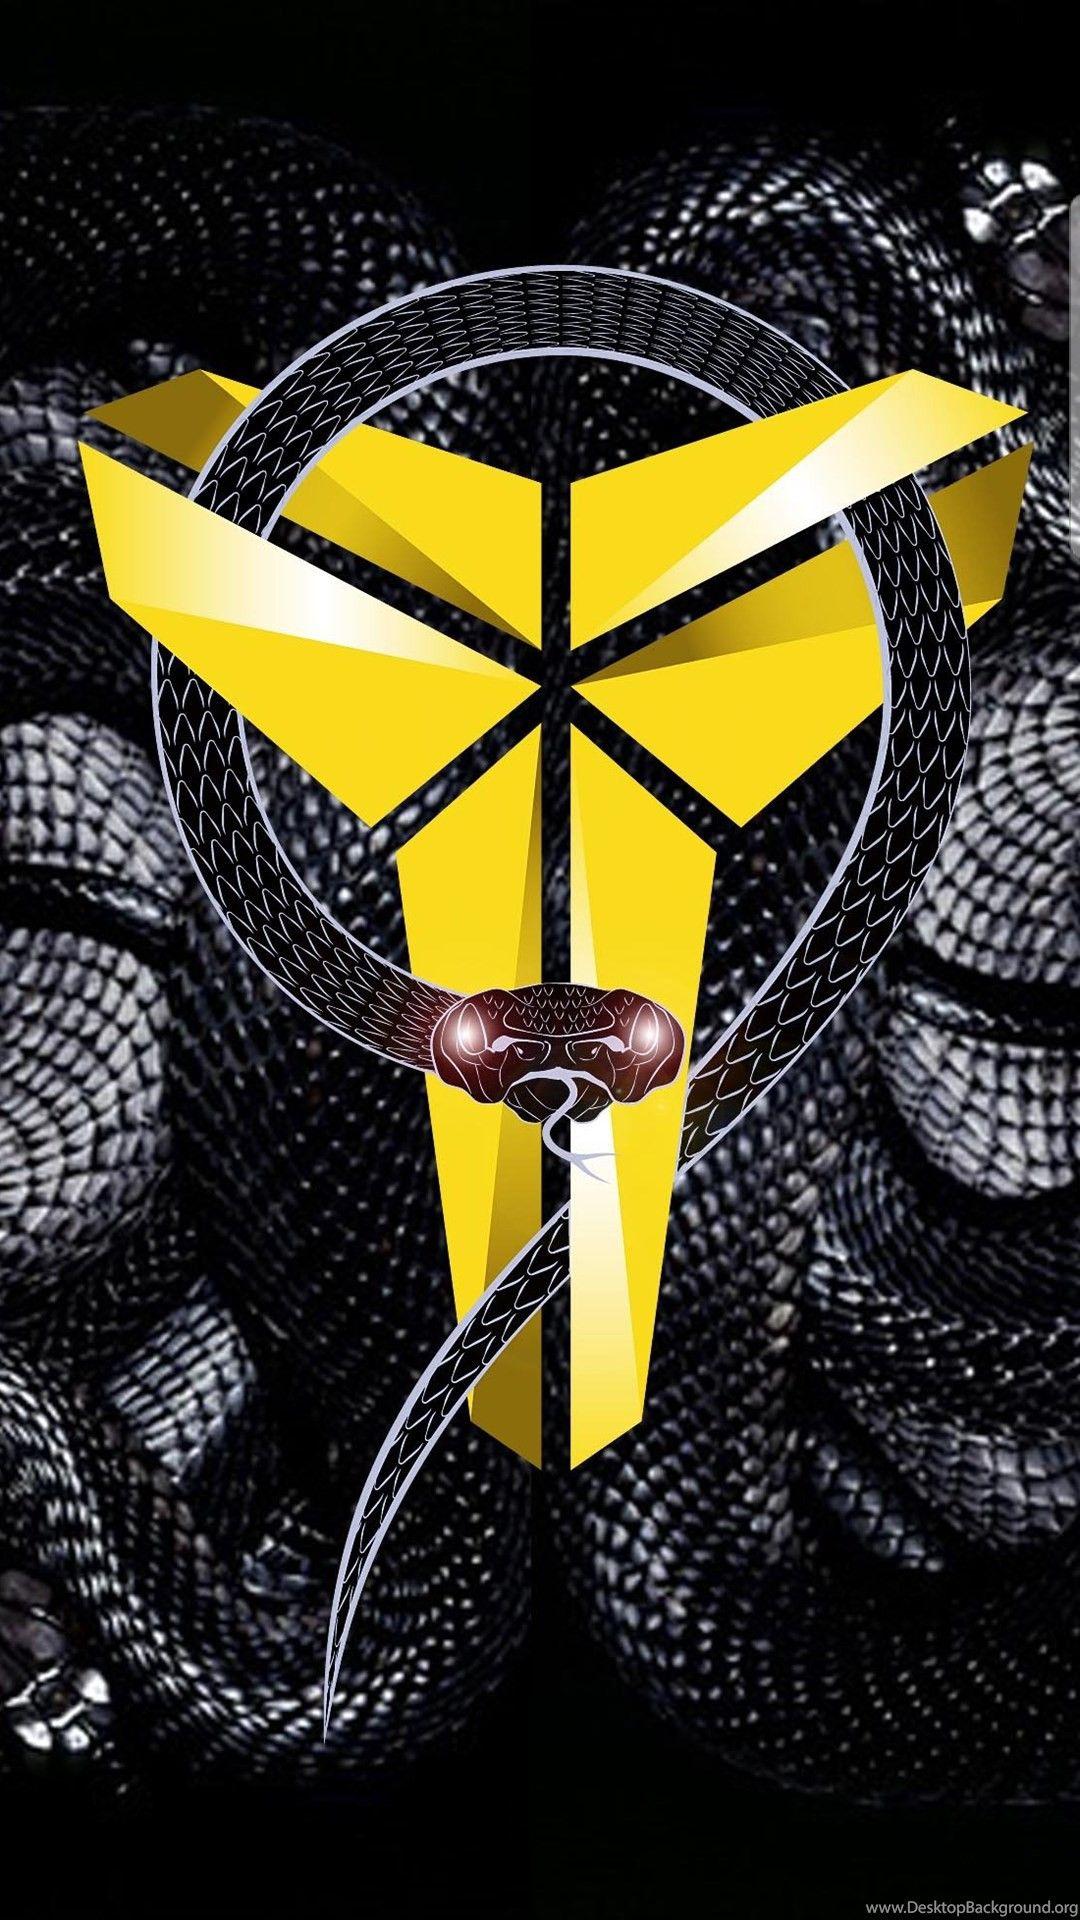 Pin by Archie Douglas on SPORTZ WALLPAPERZ Kobe bryant